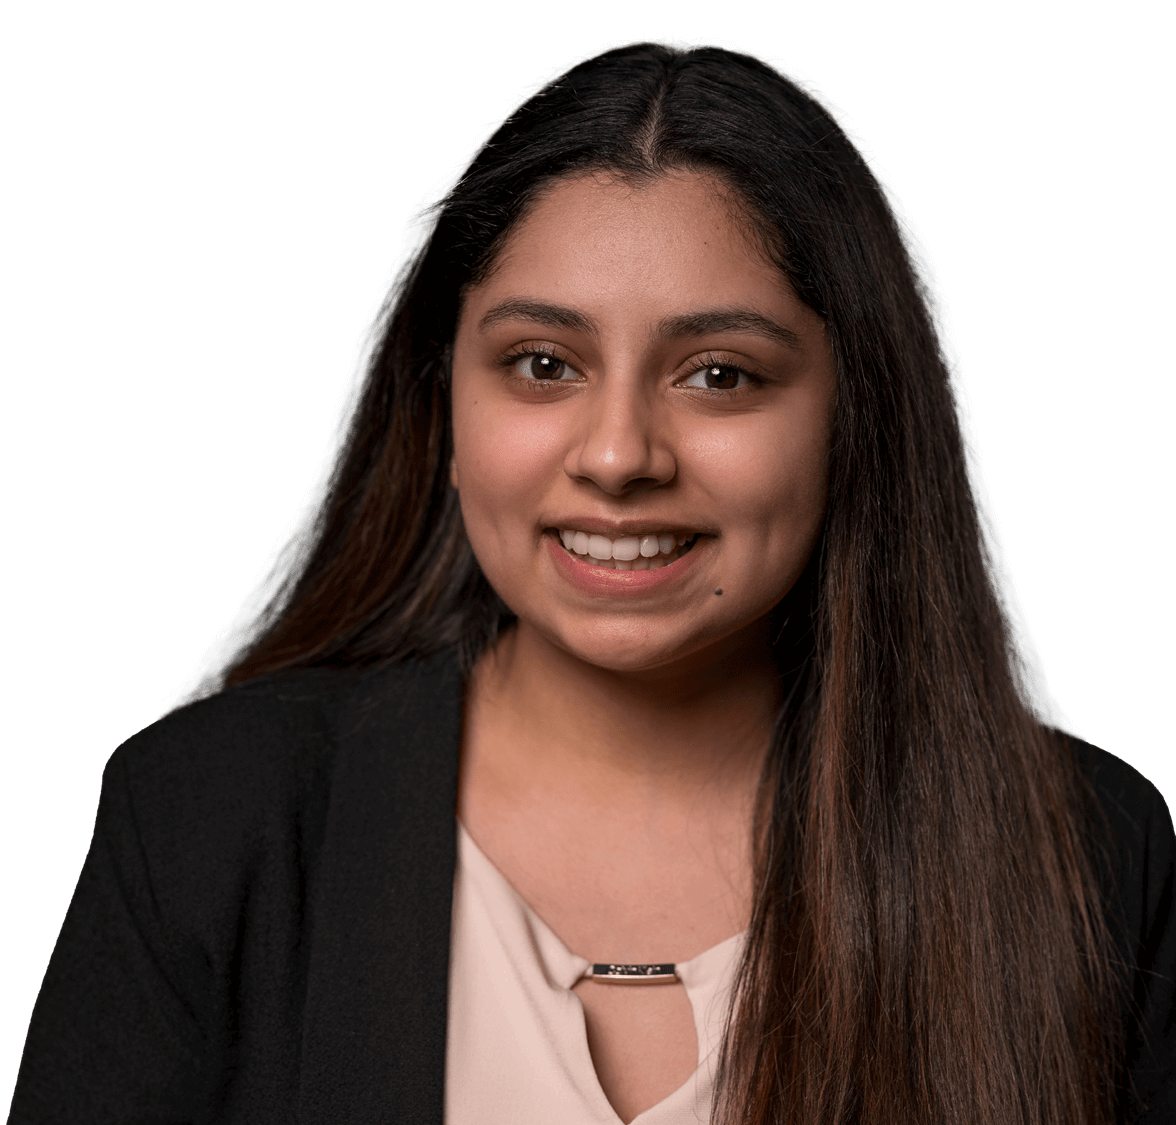 Elizabeth Martinez, student in a blazer with a pink top